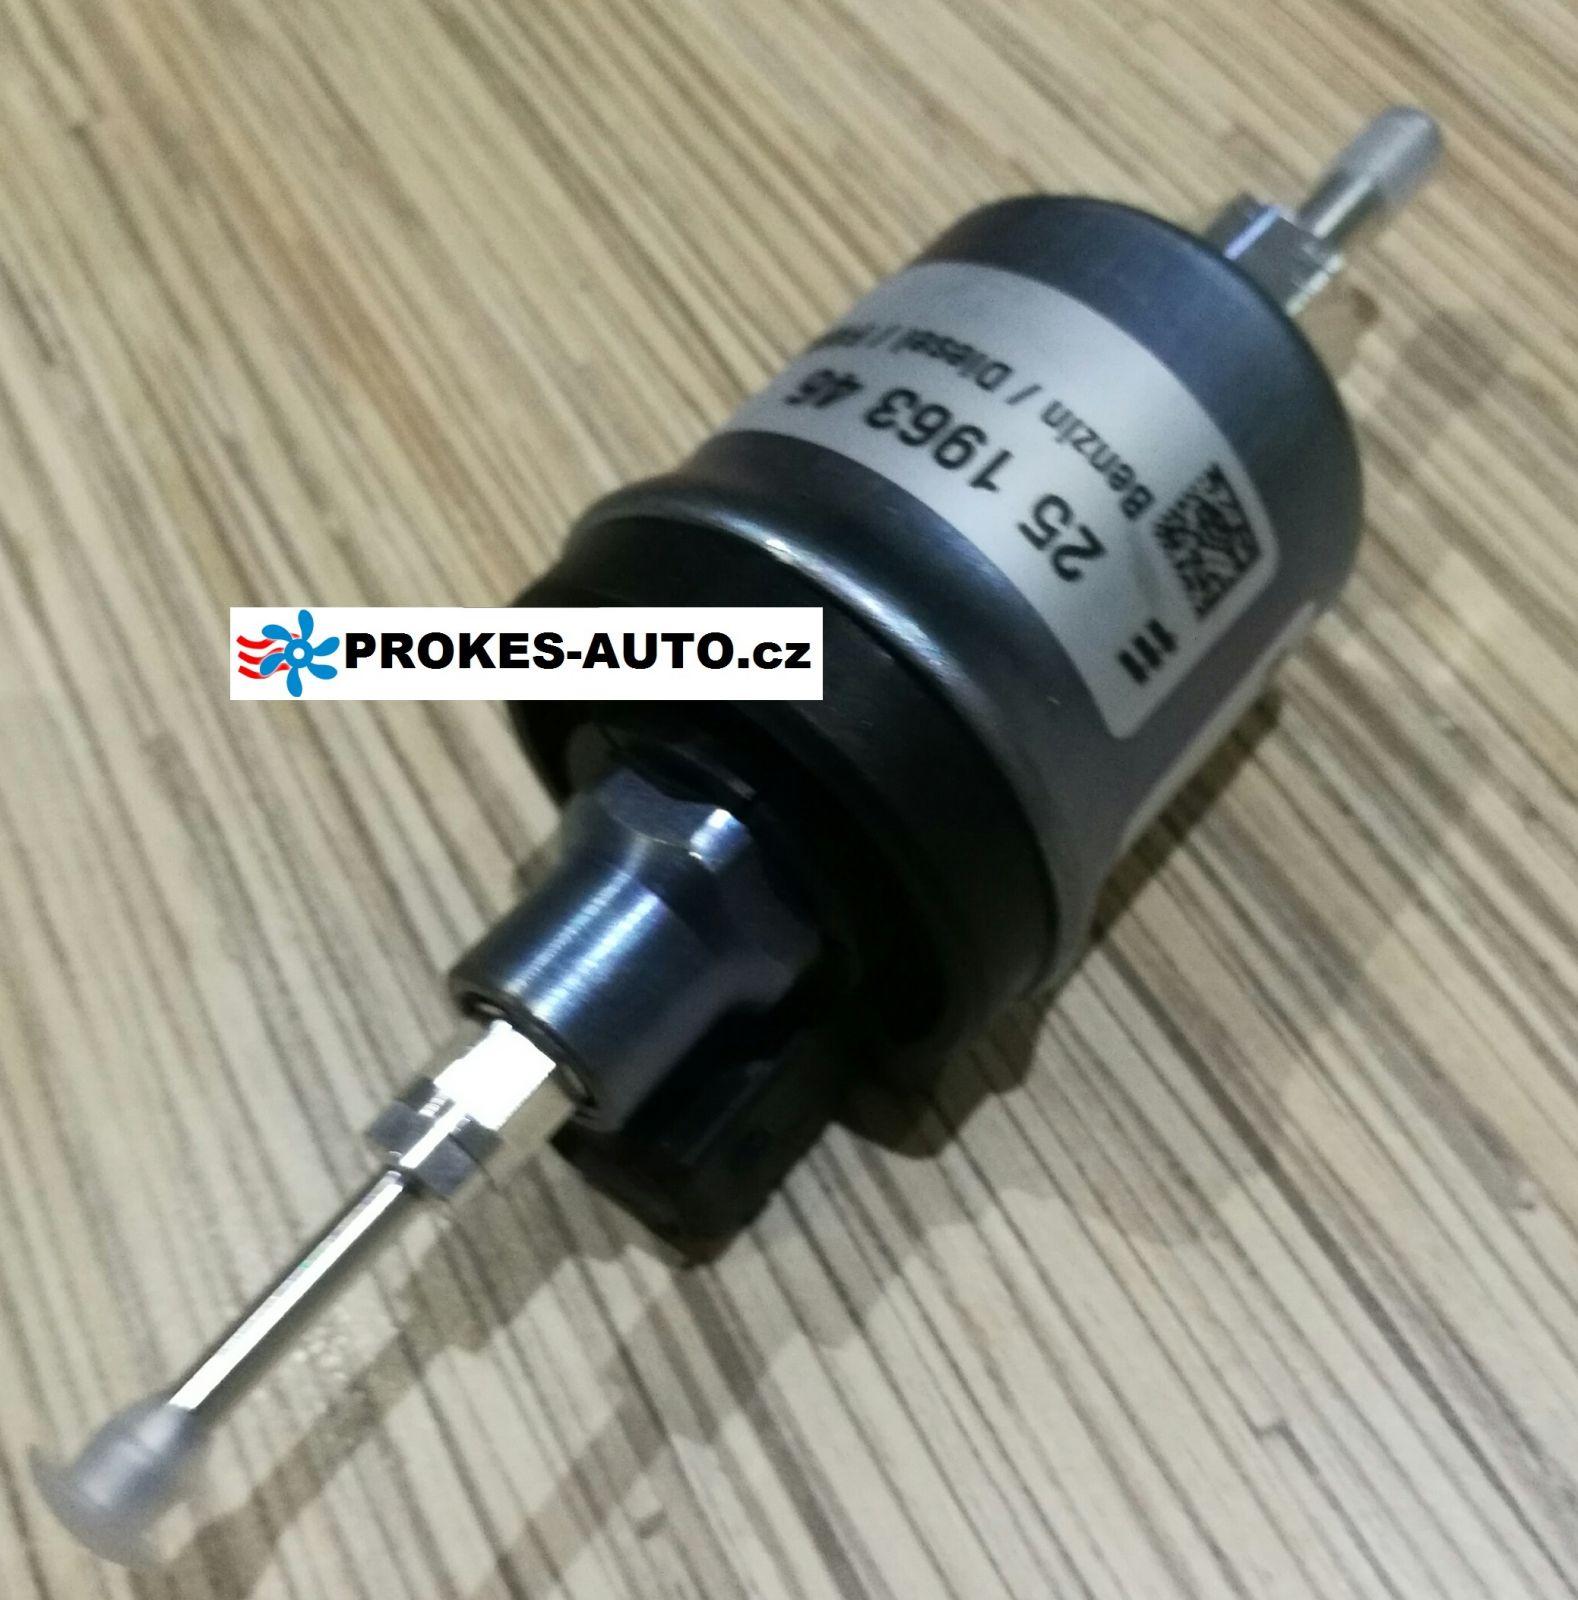 The fuel pump 24V Hydronic 10 / 25196346 Eberspächer